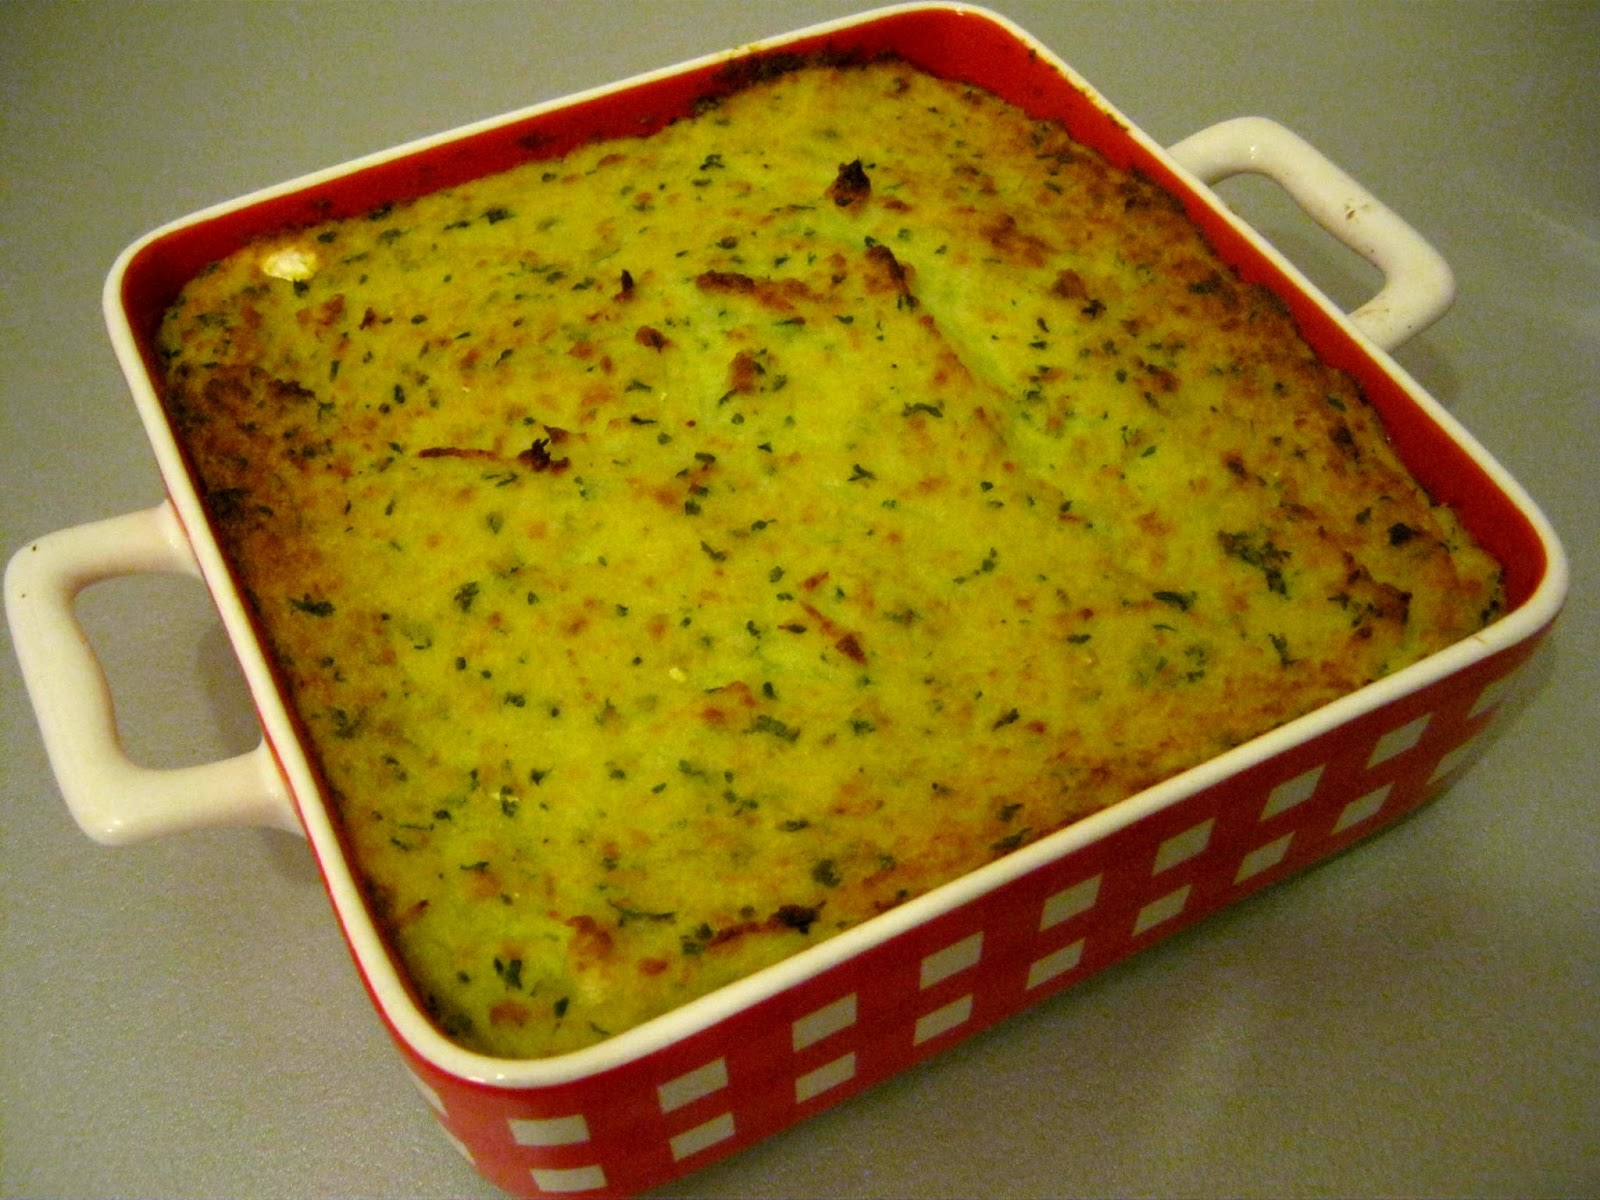 In my 39 s kitchen poissons d 39 avril brandade de morue - Cuisiner la morue dessalee ...